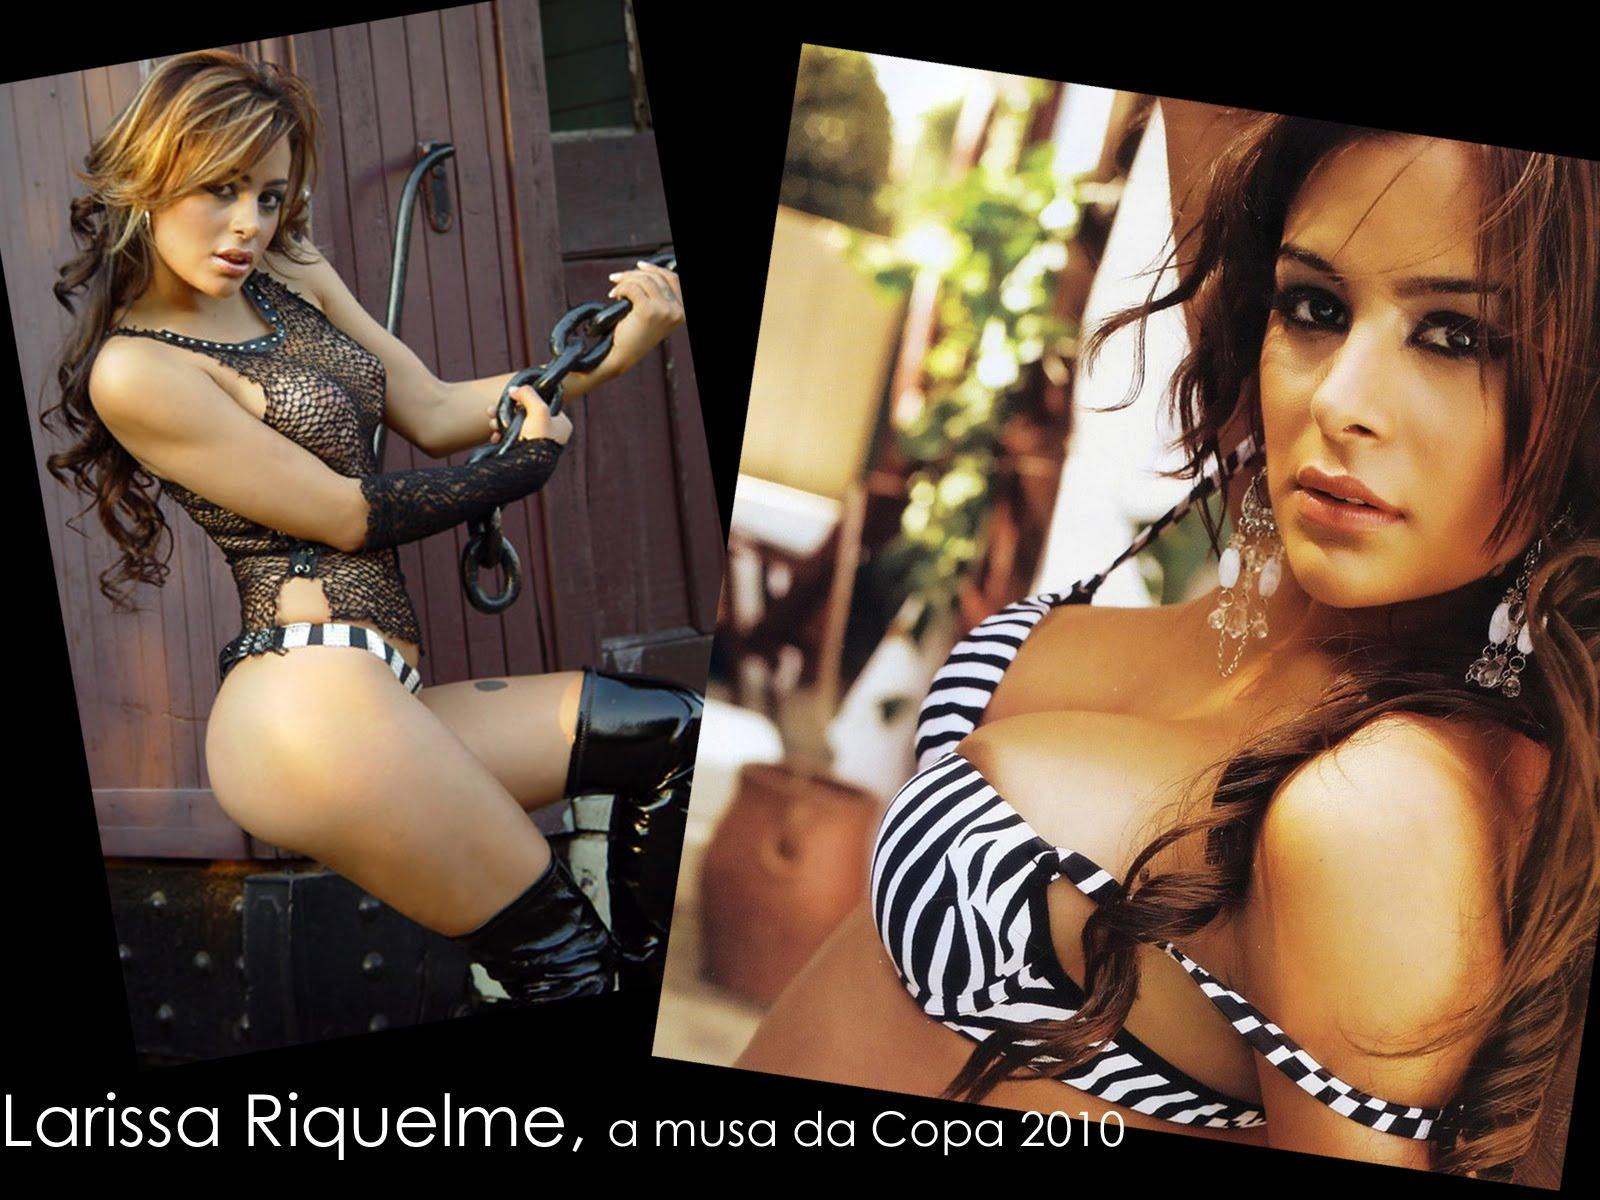 http://4.bp.blogspot.com/_kwOIOa5AC2E/TIcqxjl8JDI/AAAAAAAACLo/YLXb4pEL34g/s1600/wallpaper-larissa-riquelme.jpg